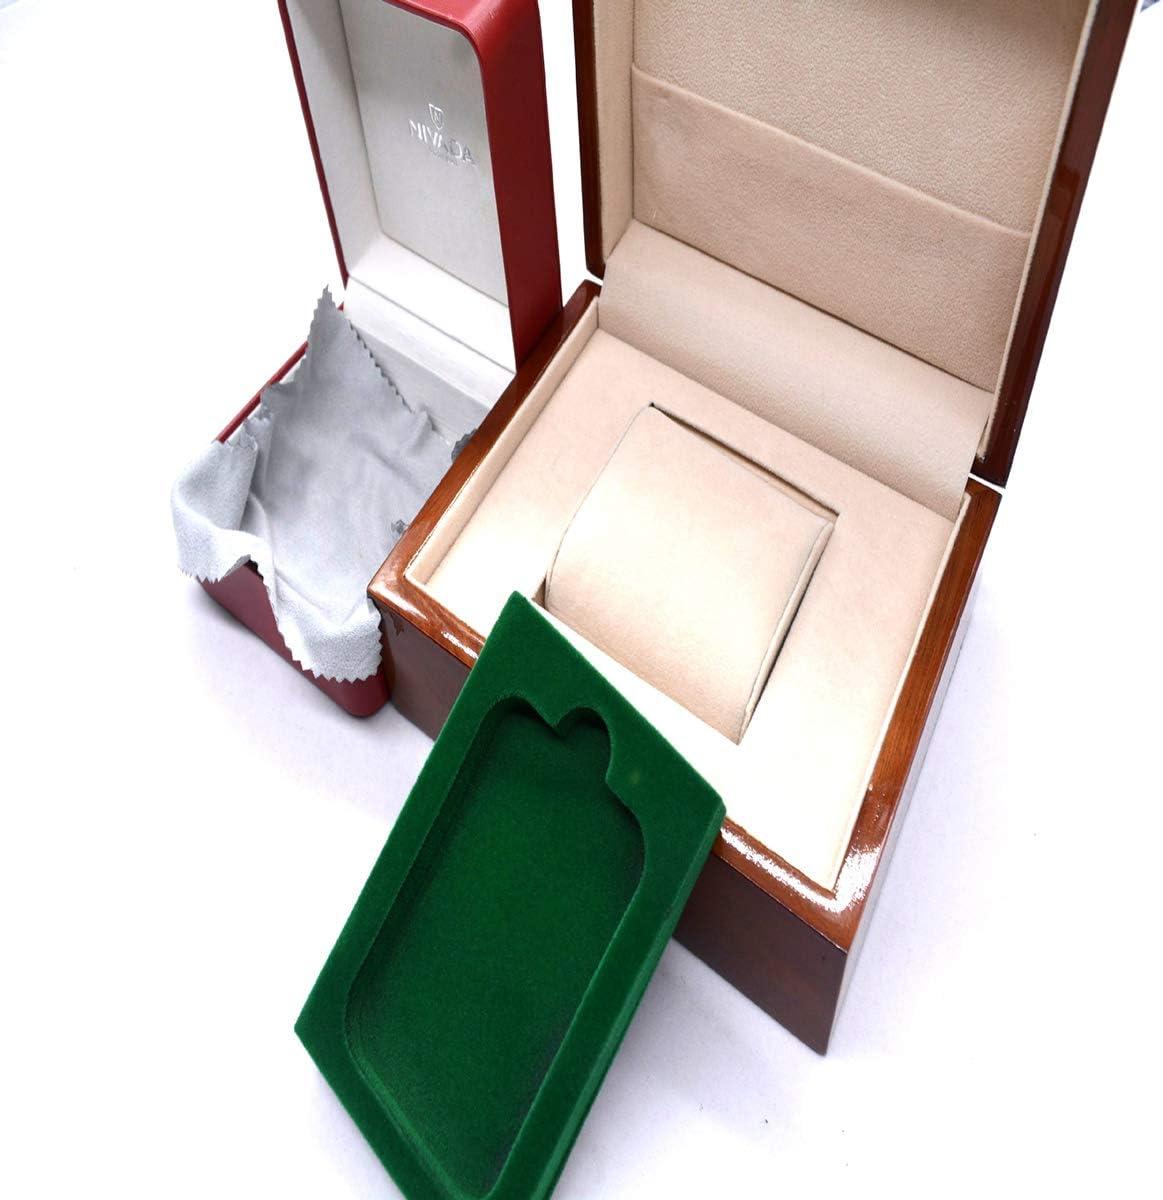 Black, 17.7x98 Inches Taogift Self Adhesive Black Velvet Flock Contact Paper Shelf Liner for Drawer Dresser Cabinets Jewlery Displays Backsplash Arts Crafts Decor